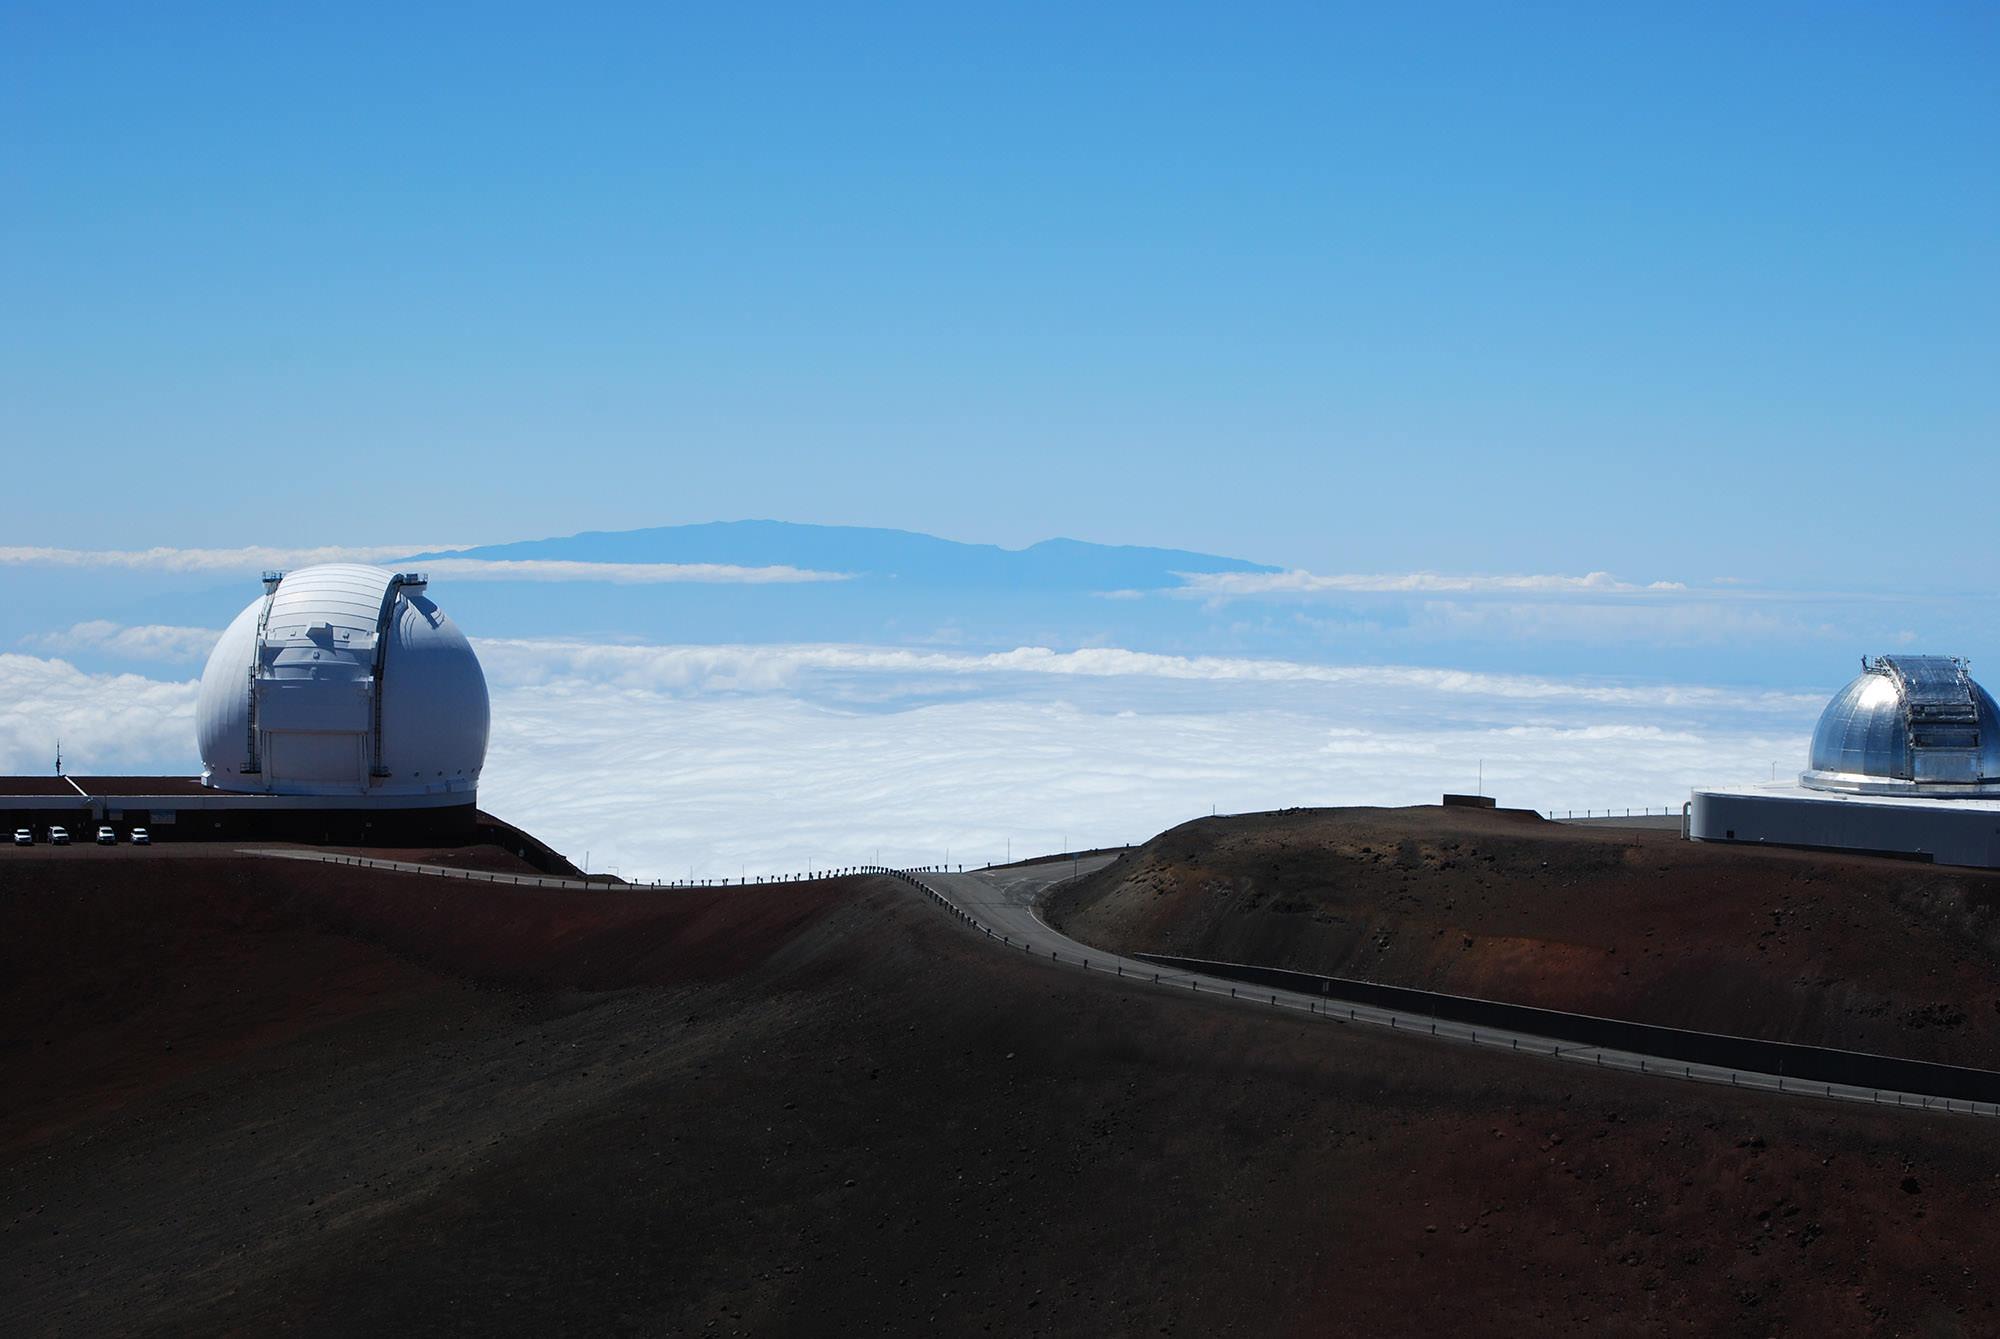 Fig. 18 Summit of Mauna Kea (Mauna a Wākea), Hawai'i Island, showing two observatories, looking toward Haleakala on island of Maui visible in distance, August 2014. Photo: ©Sally Promey